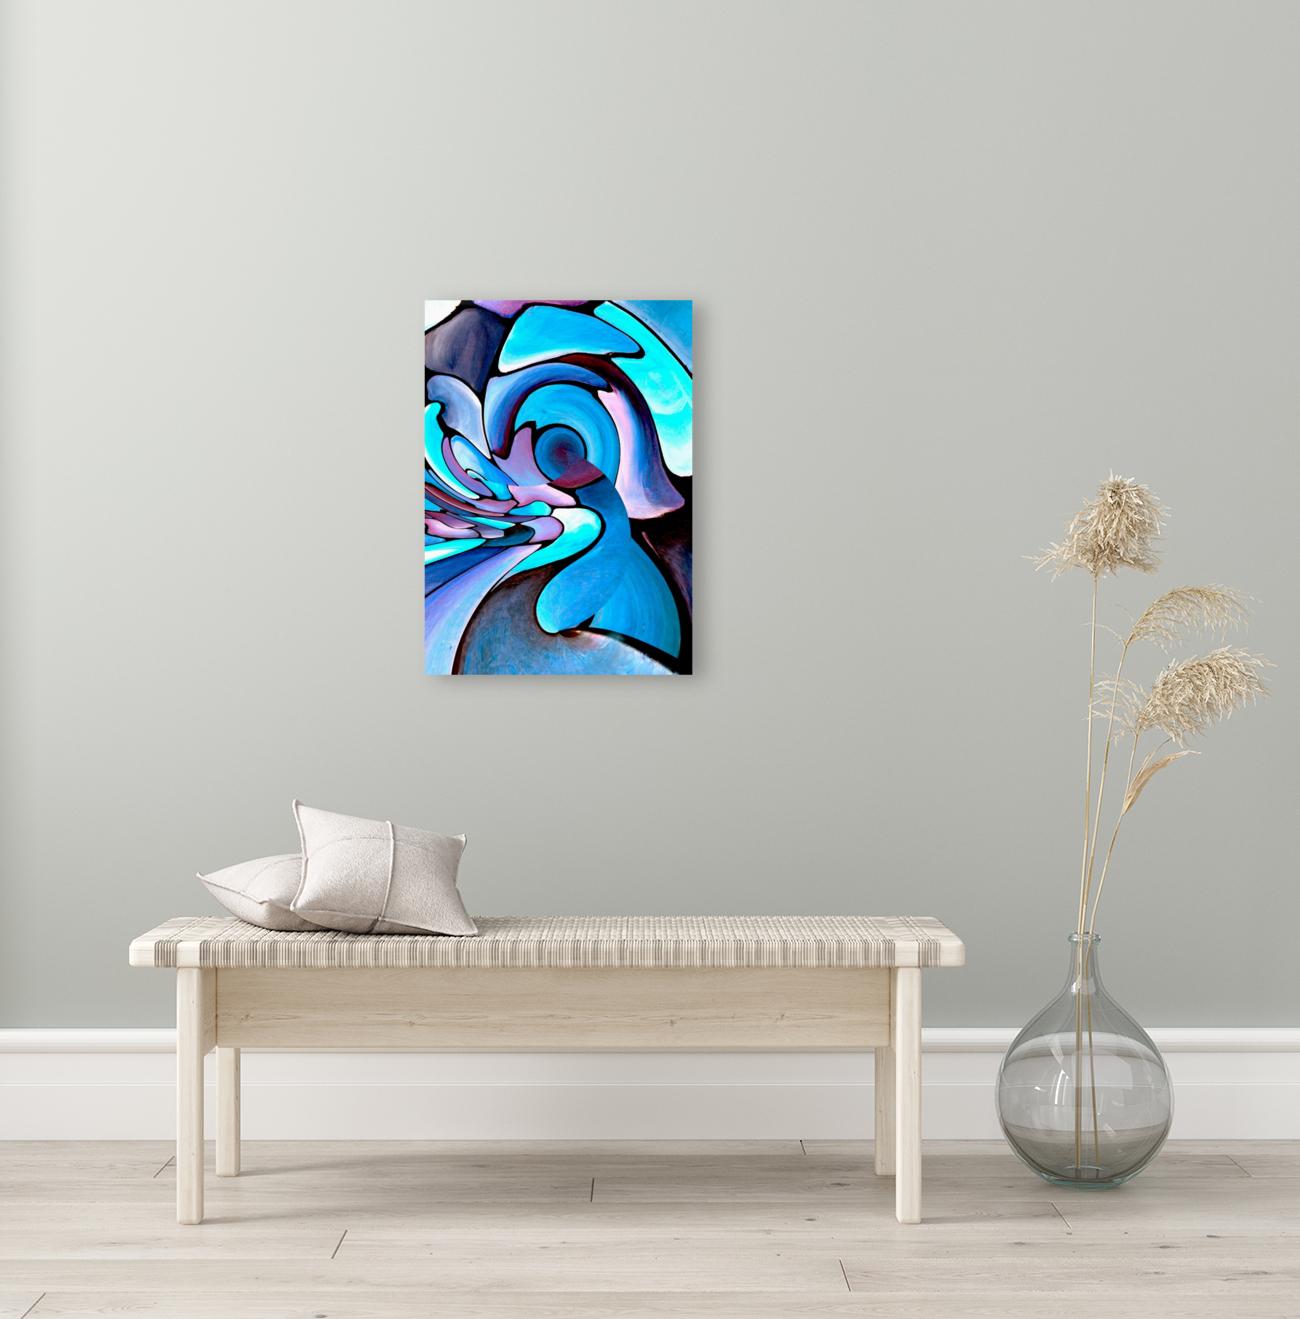 Twisted Splash of Blue Shapes   Art